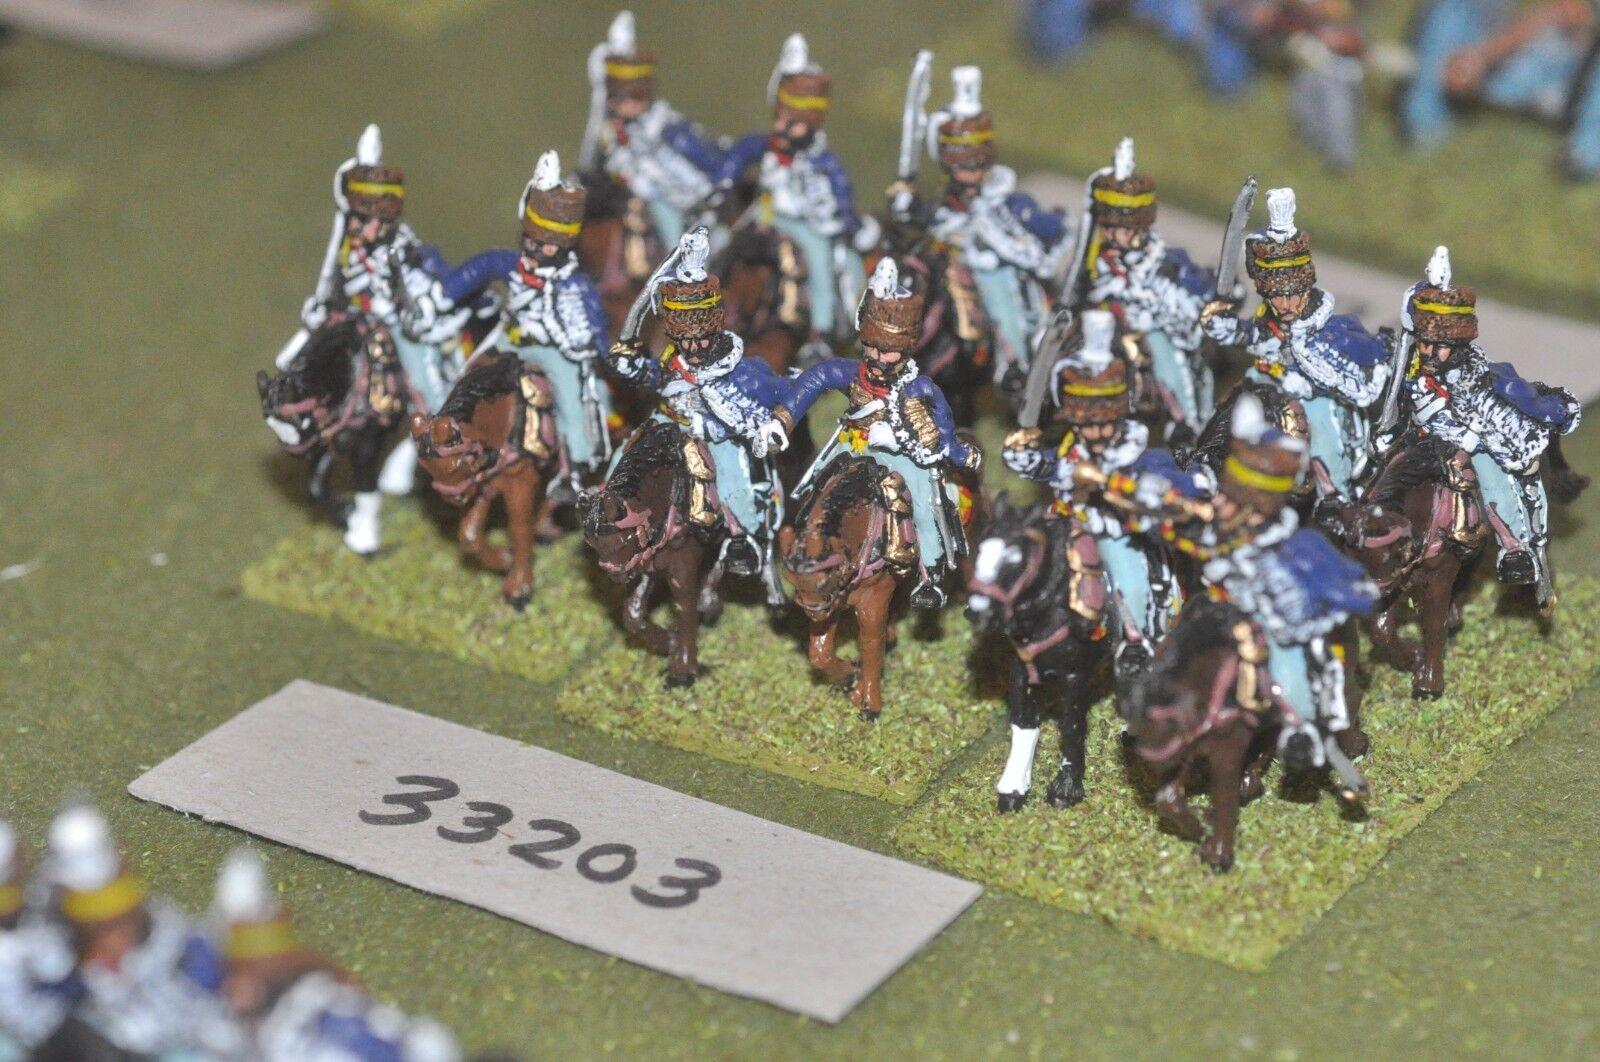 25mm napoleonic   british - hussars 12 figures - cav (33203)